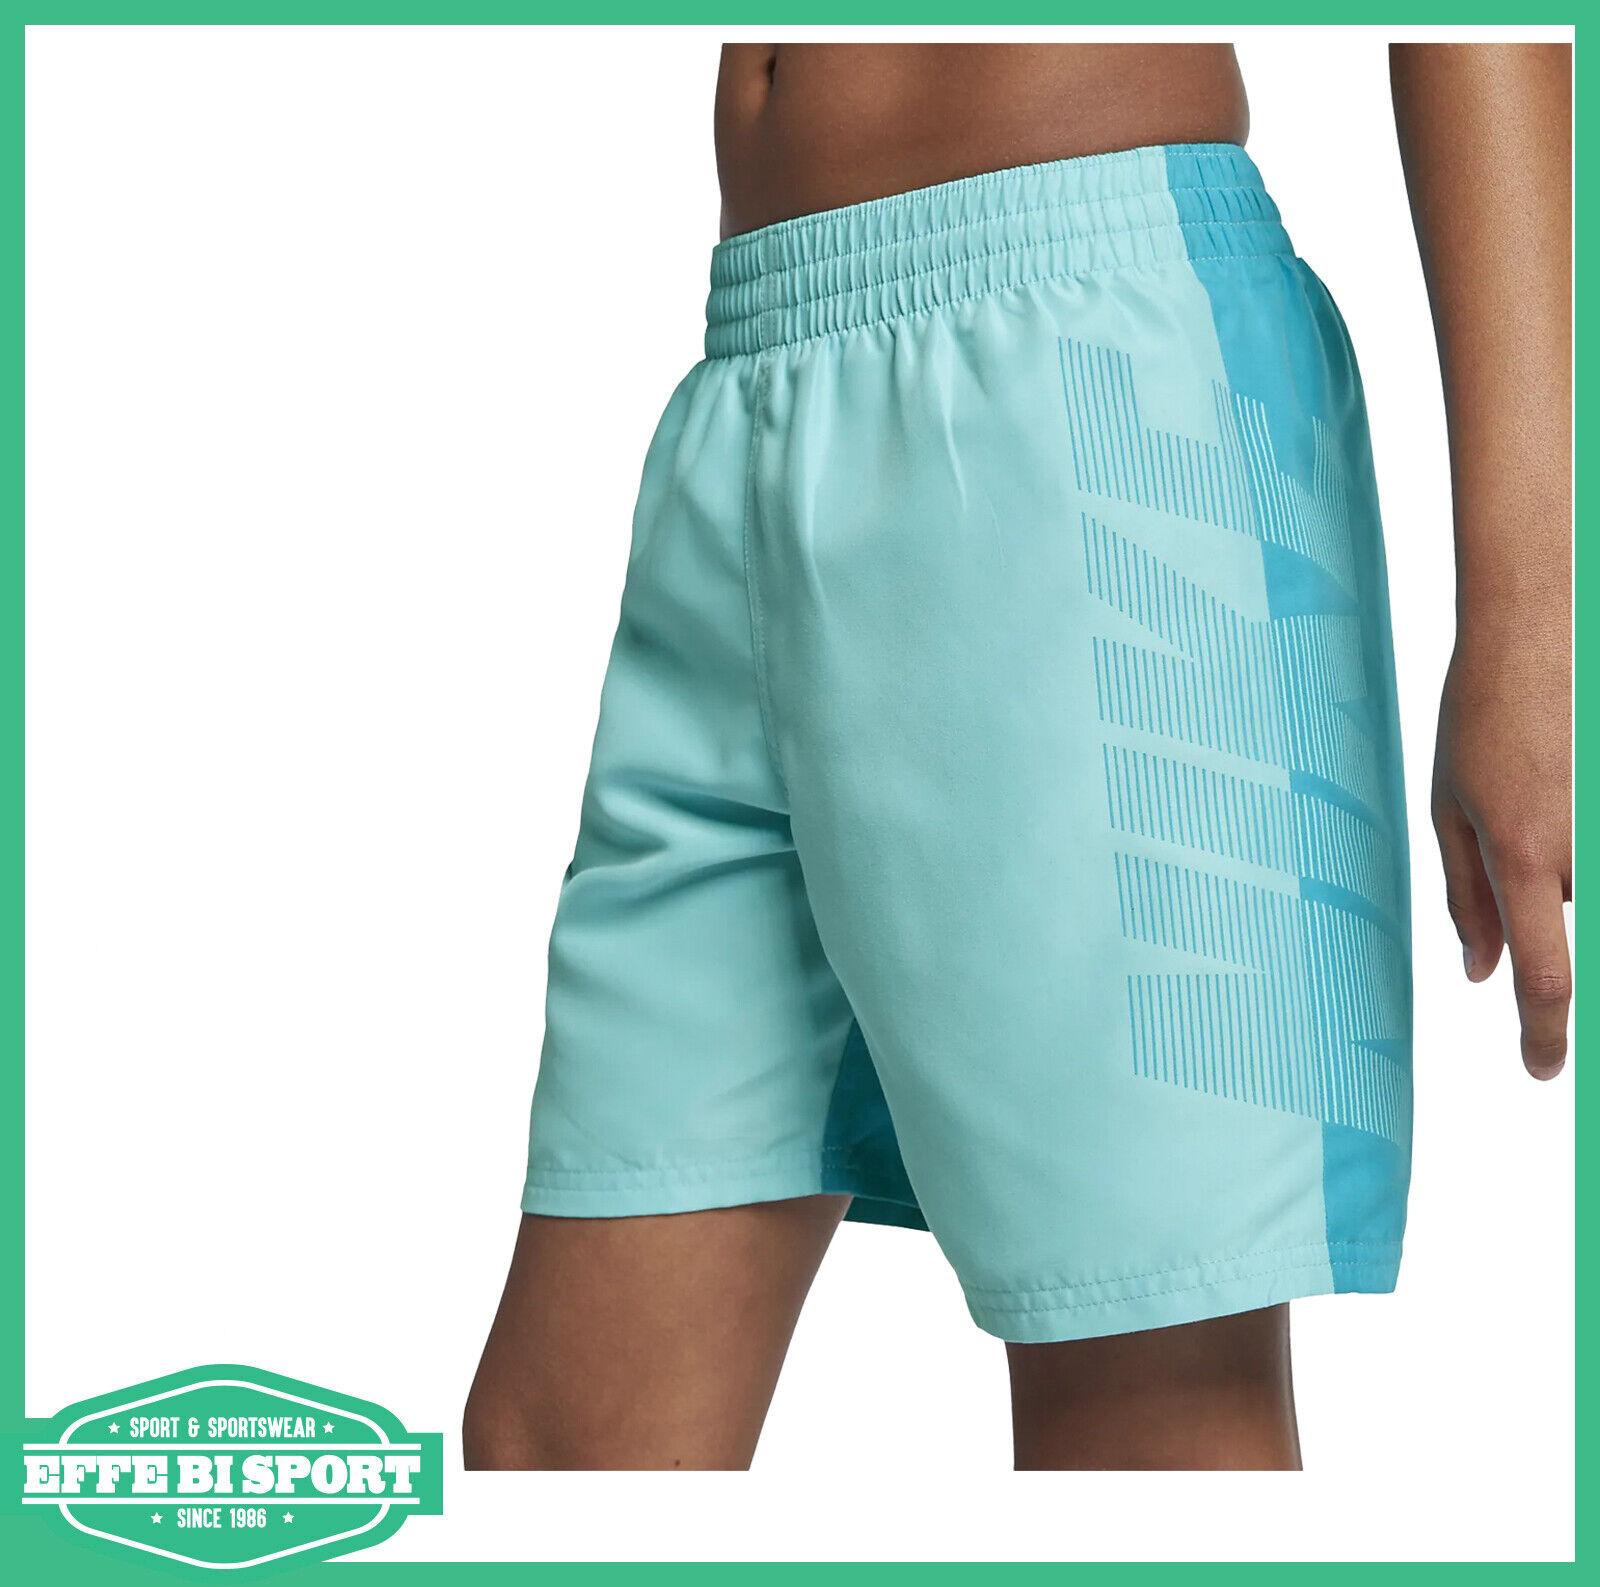 Nike costume uomo pantalincino mare piscina 16